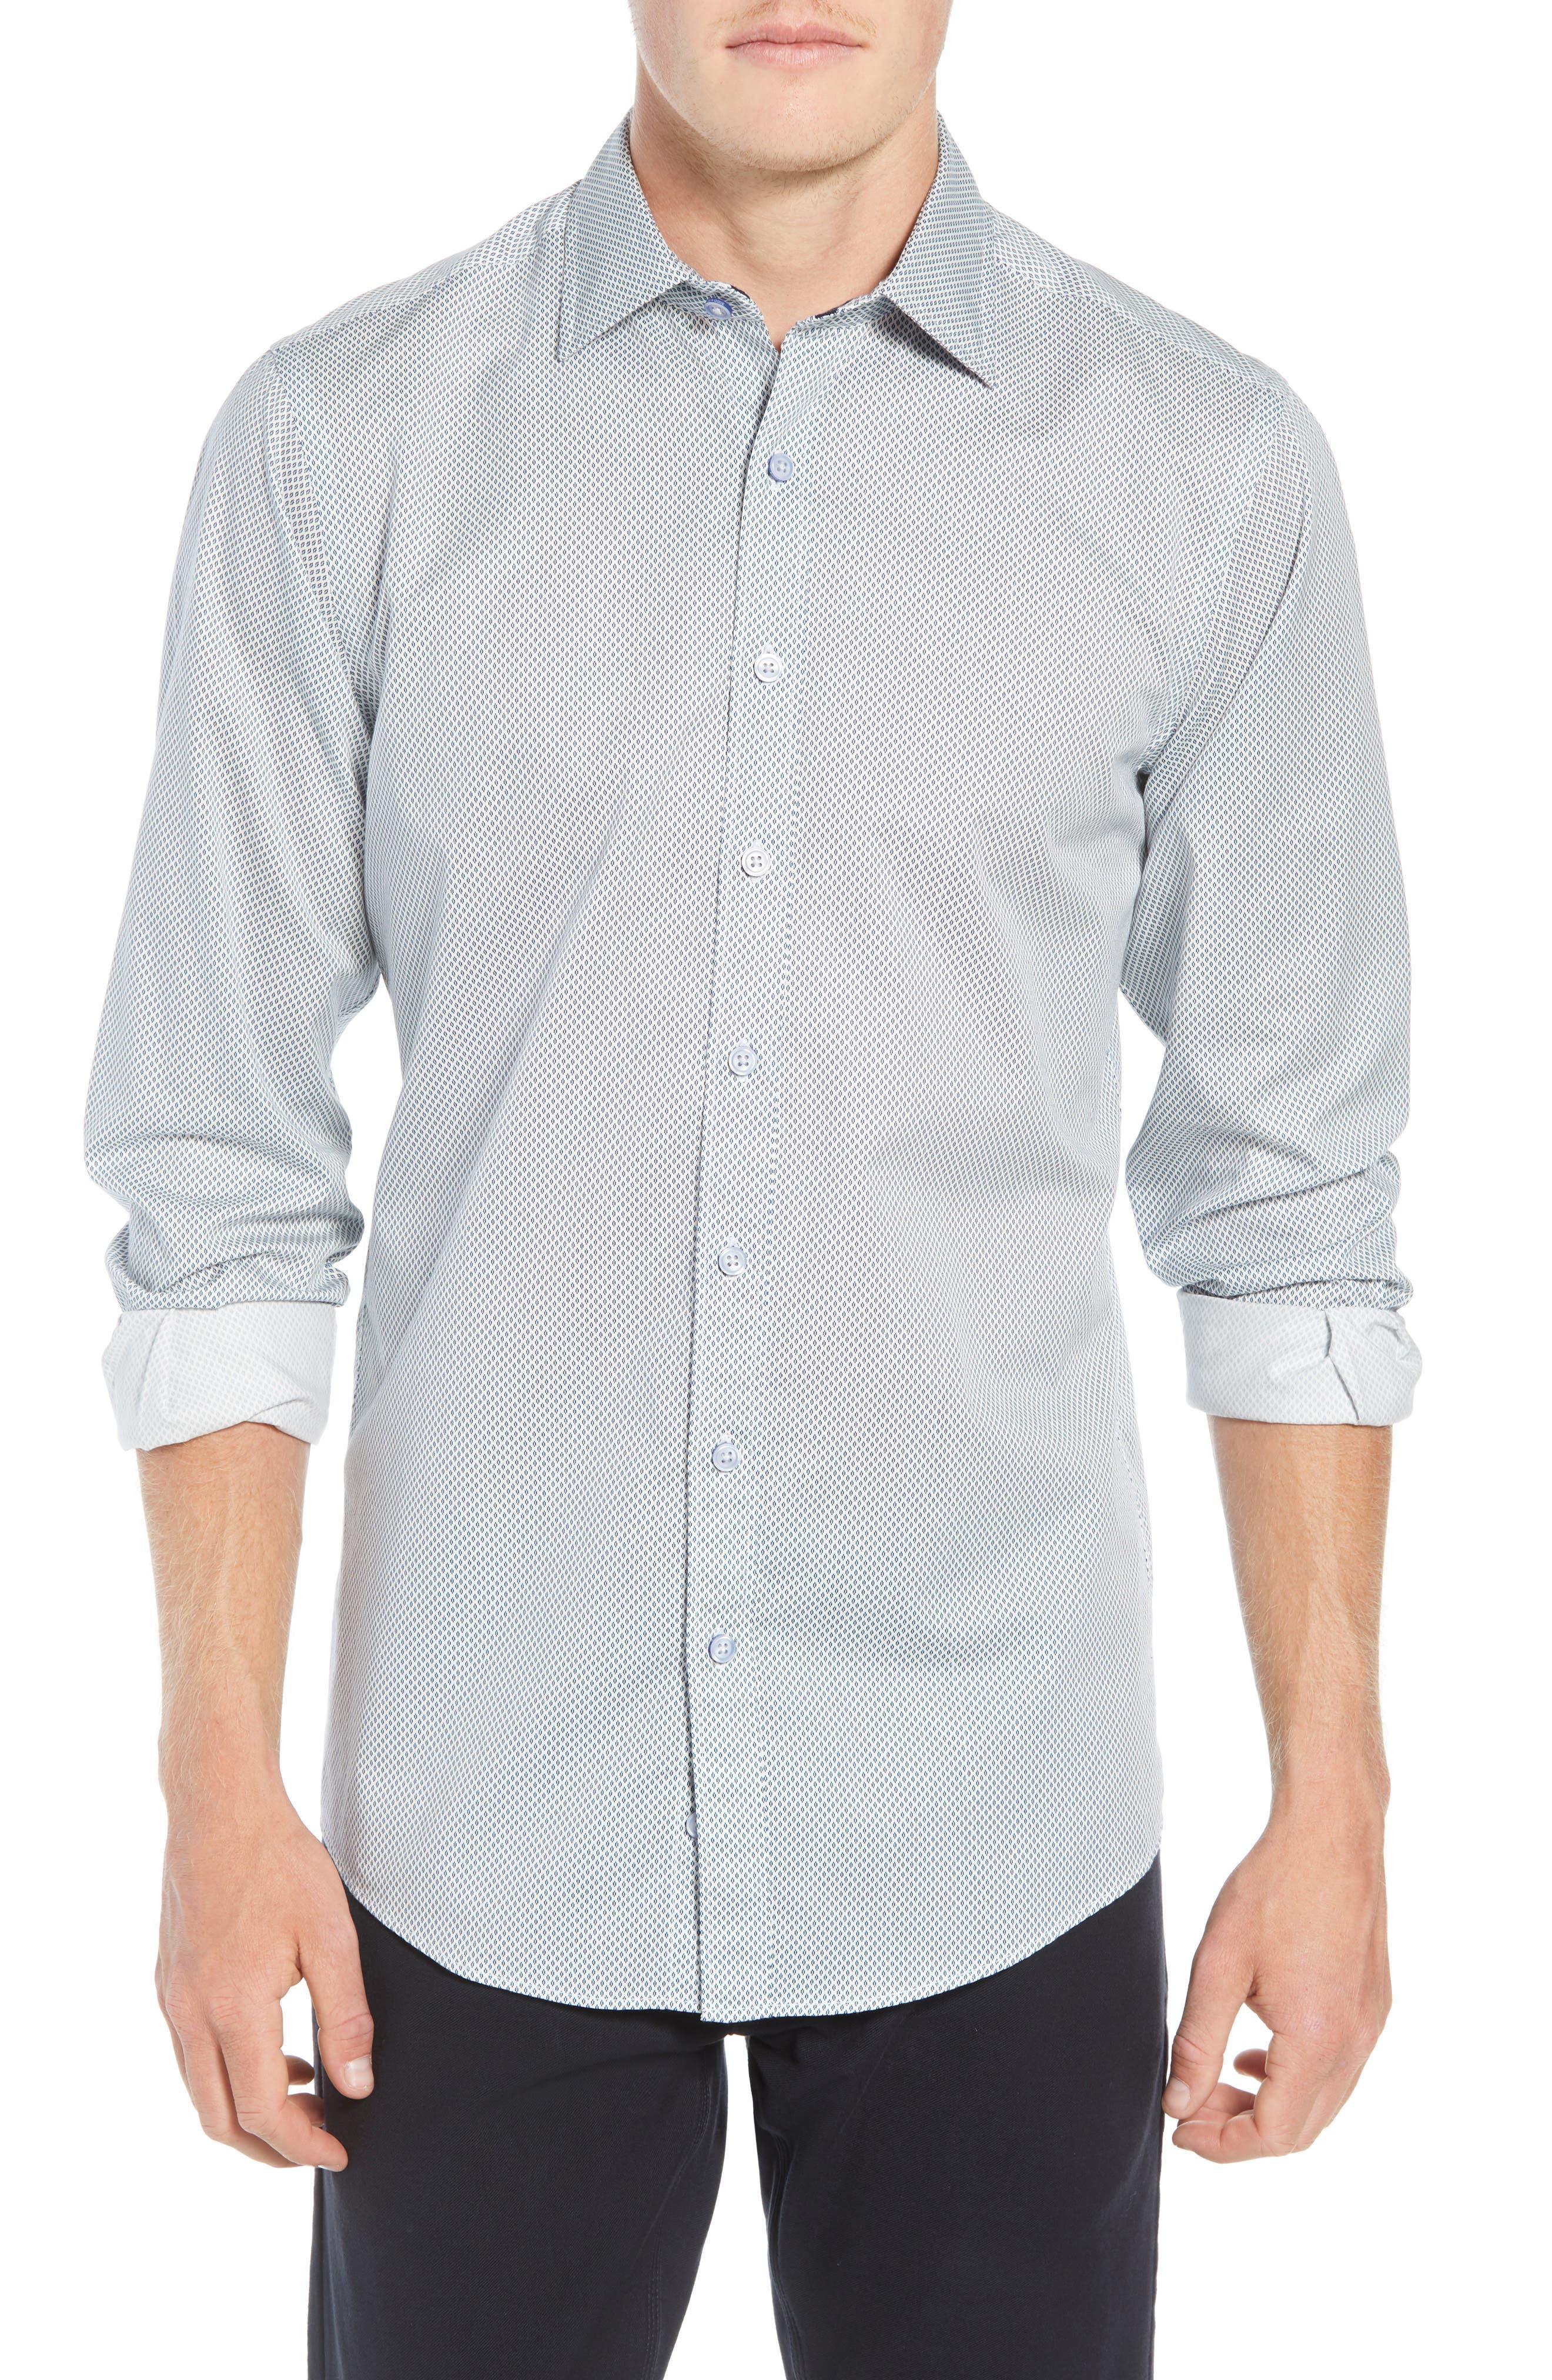 RODD & GUNN, Helston Way Regular Fit Sport Shirt, Main thumbnail 1, color, SNOW